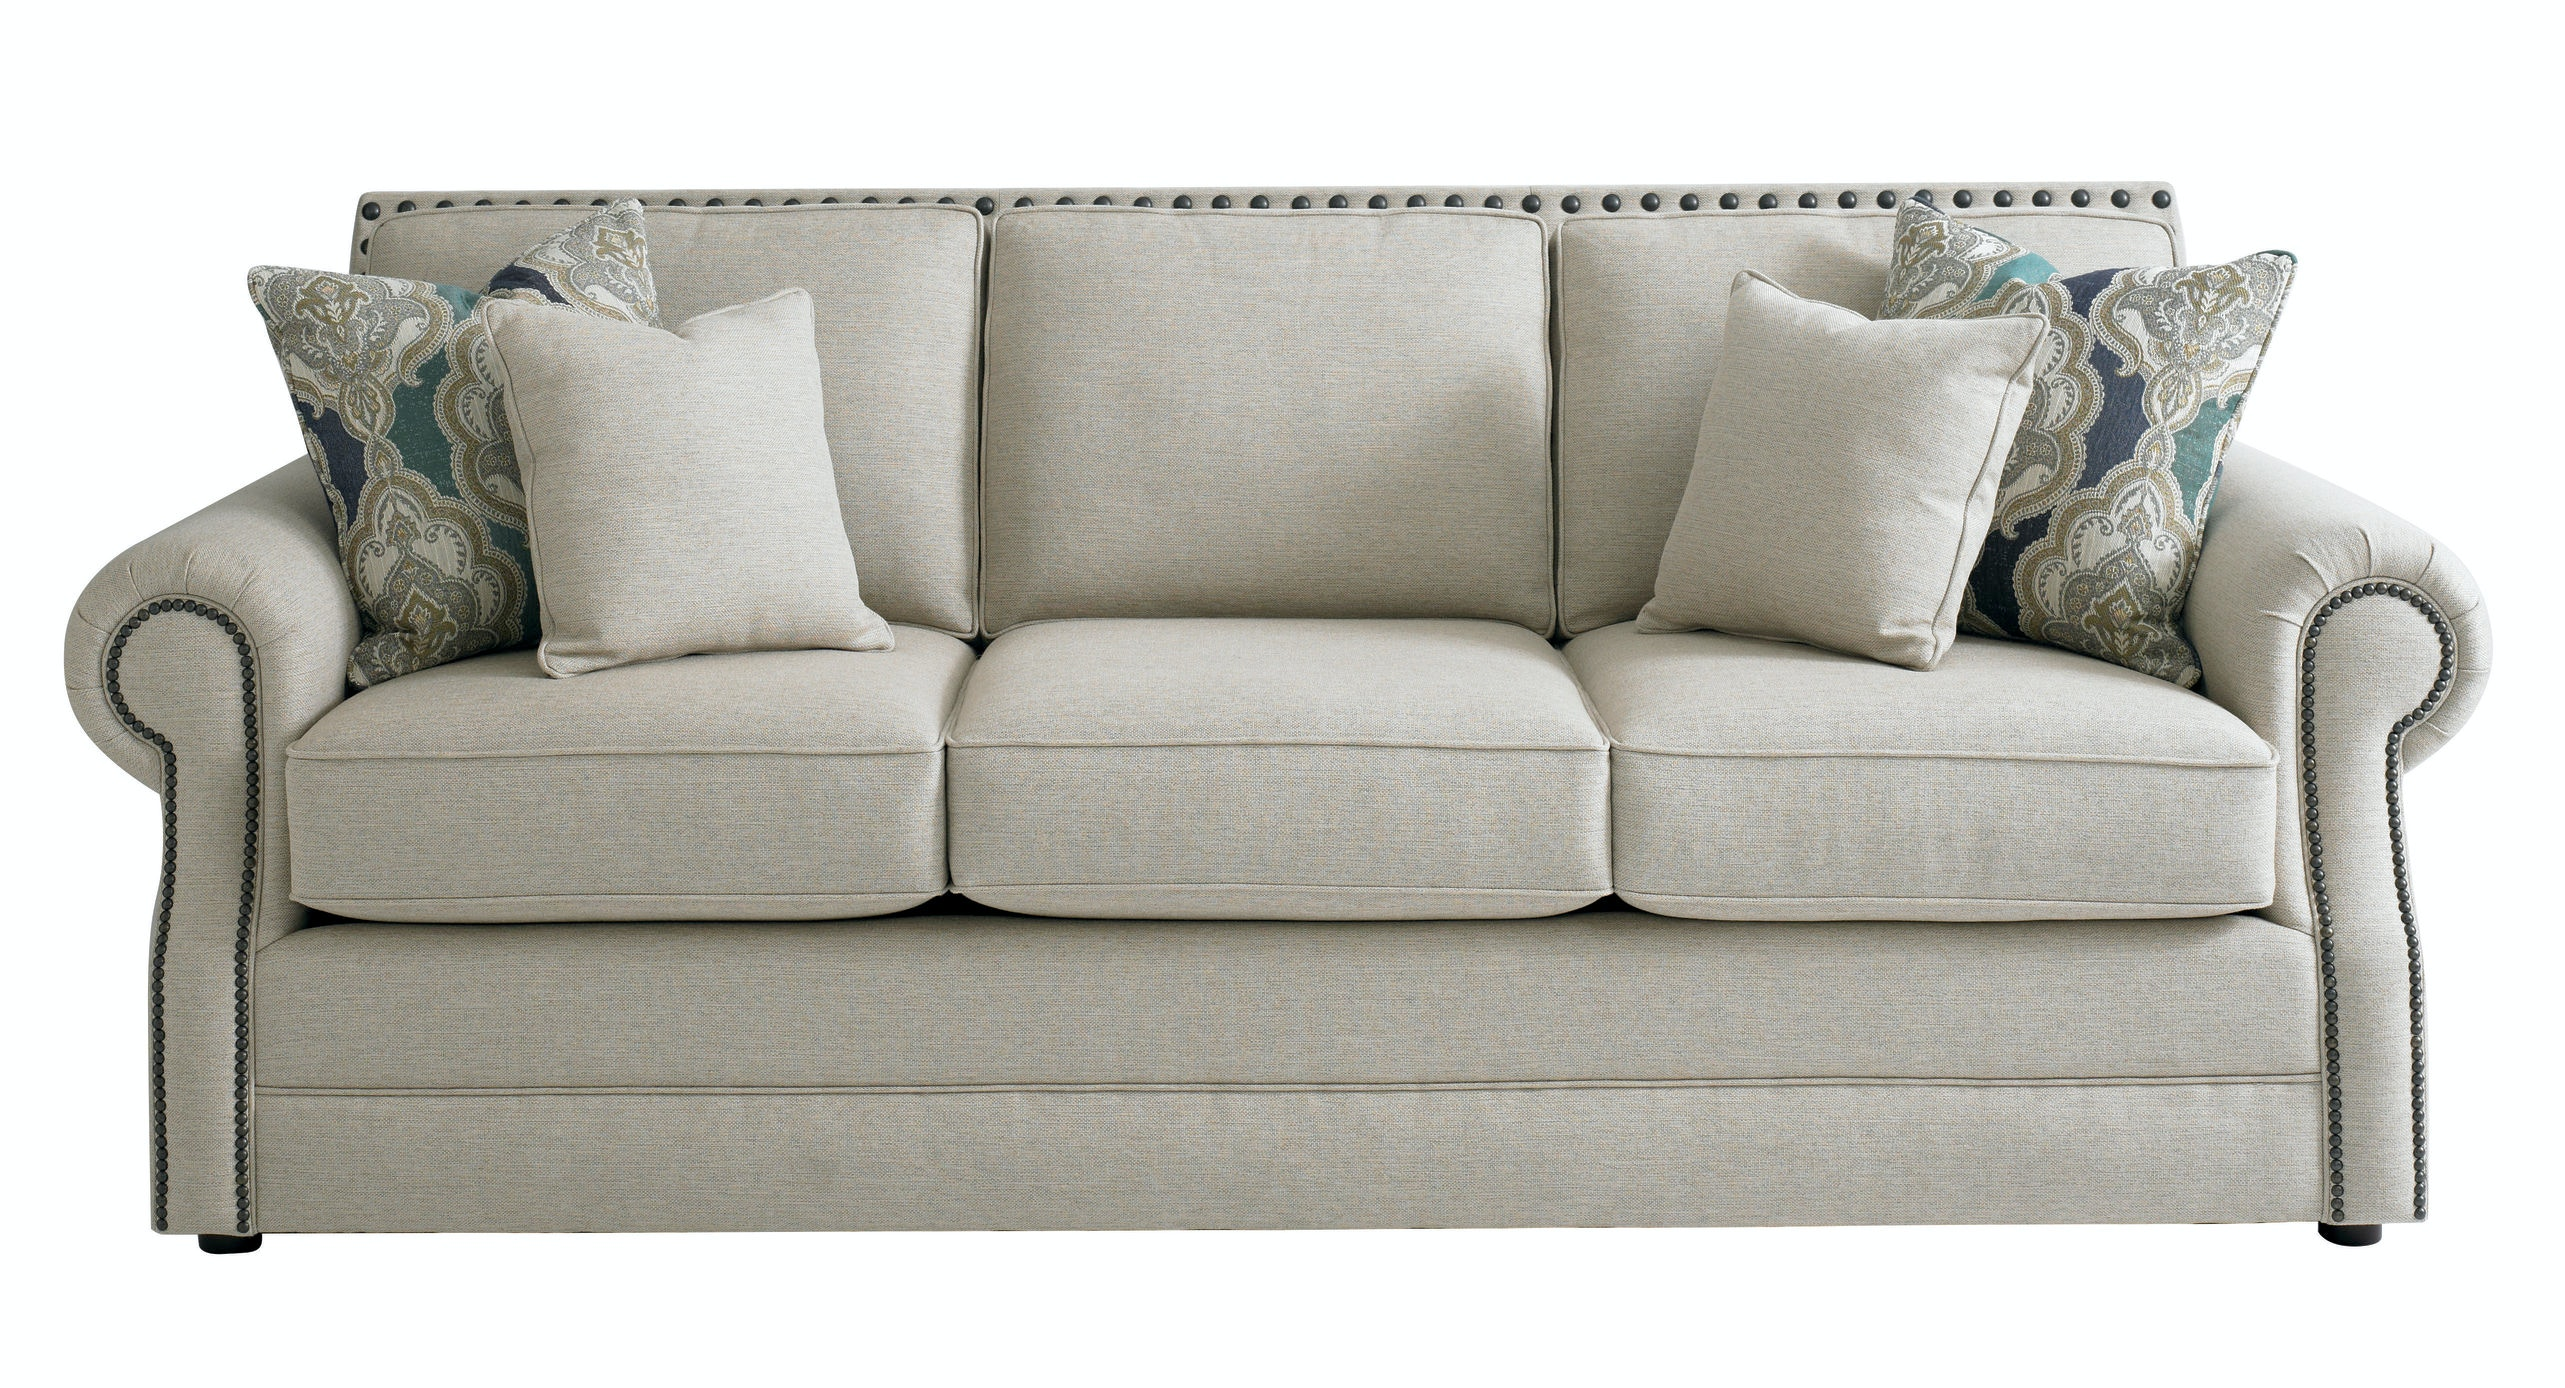 Bassett Hubbard Sofa With Pillows 698042